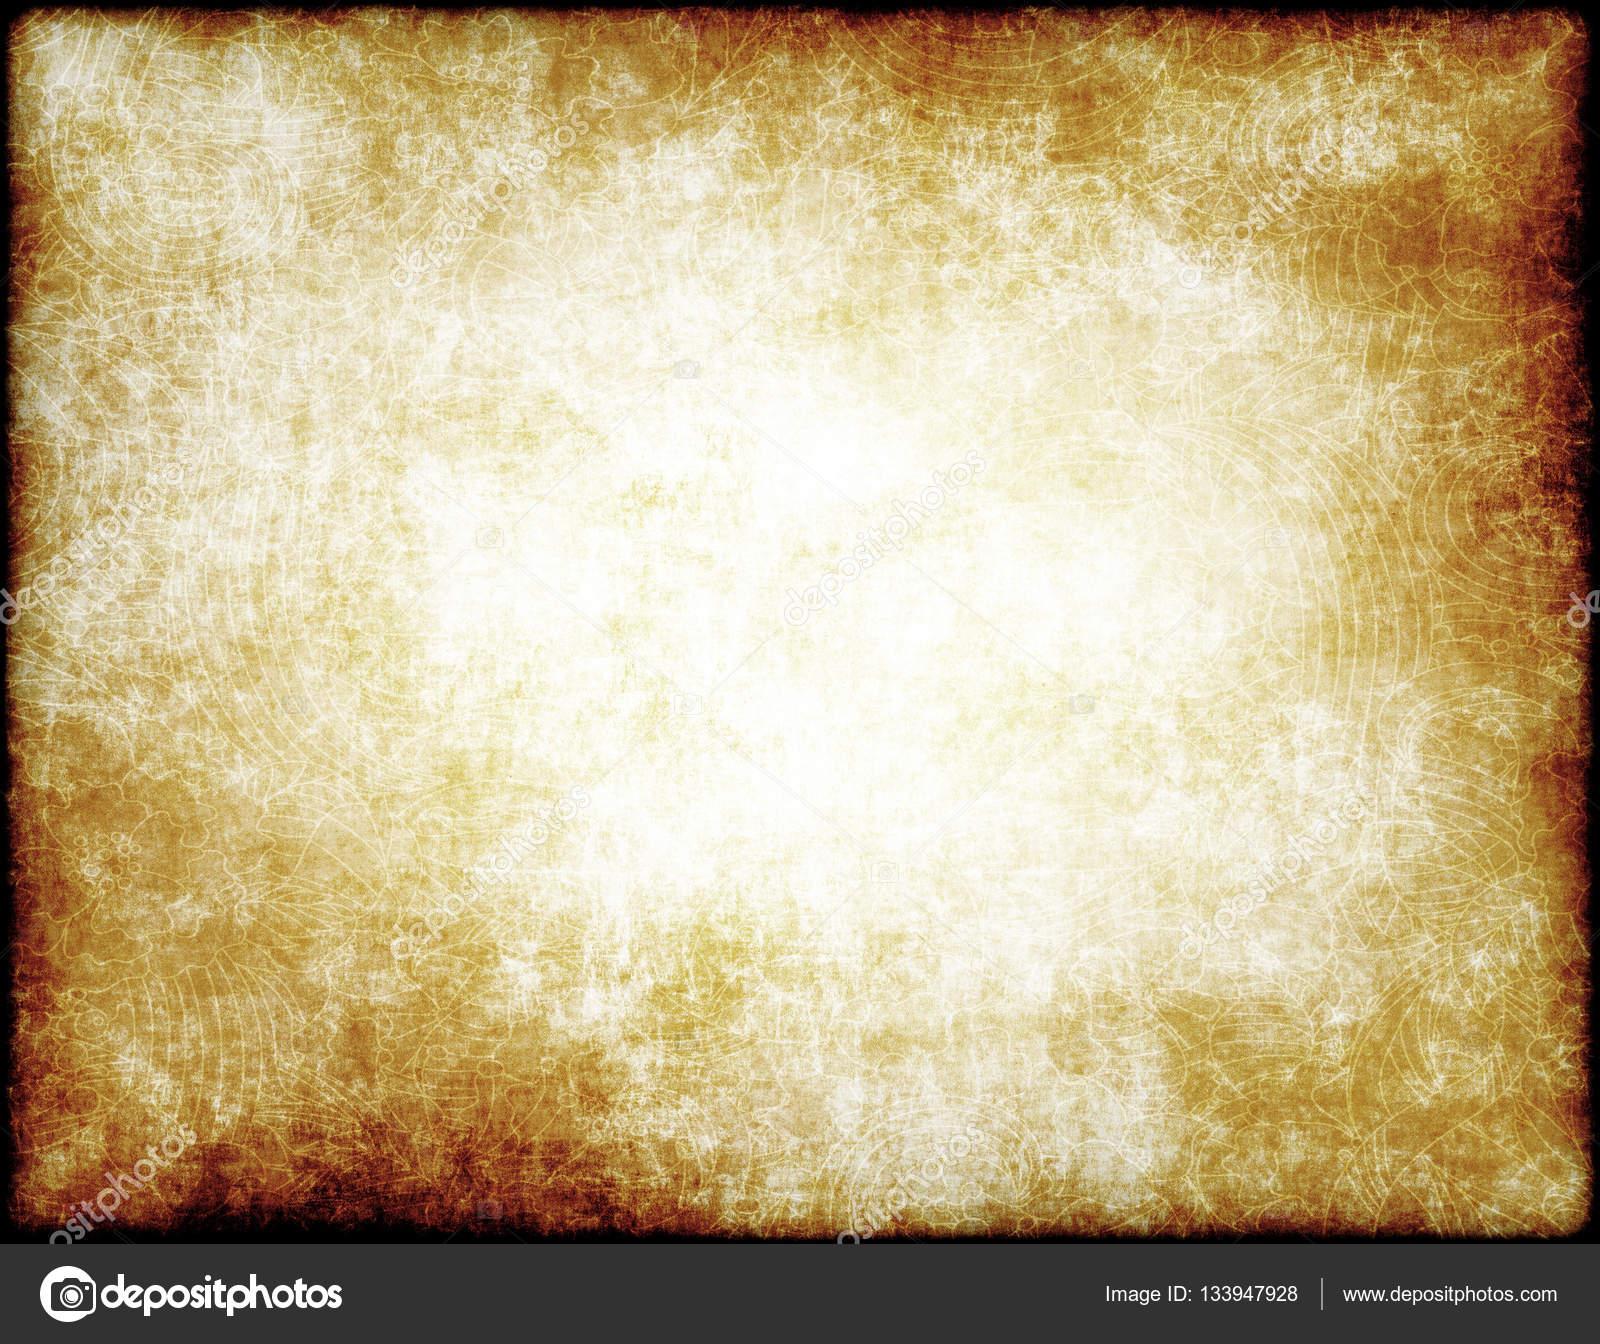 Popular victorian large old paper background — Stock Photo © DigitalMagus  SE45